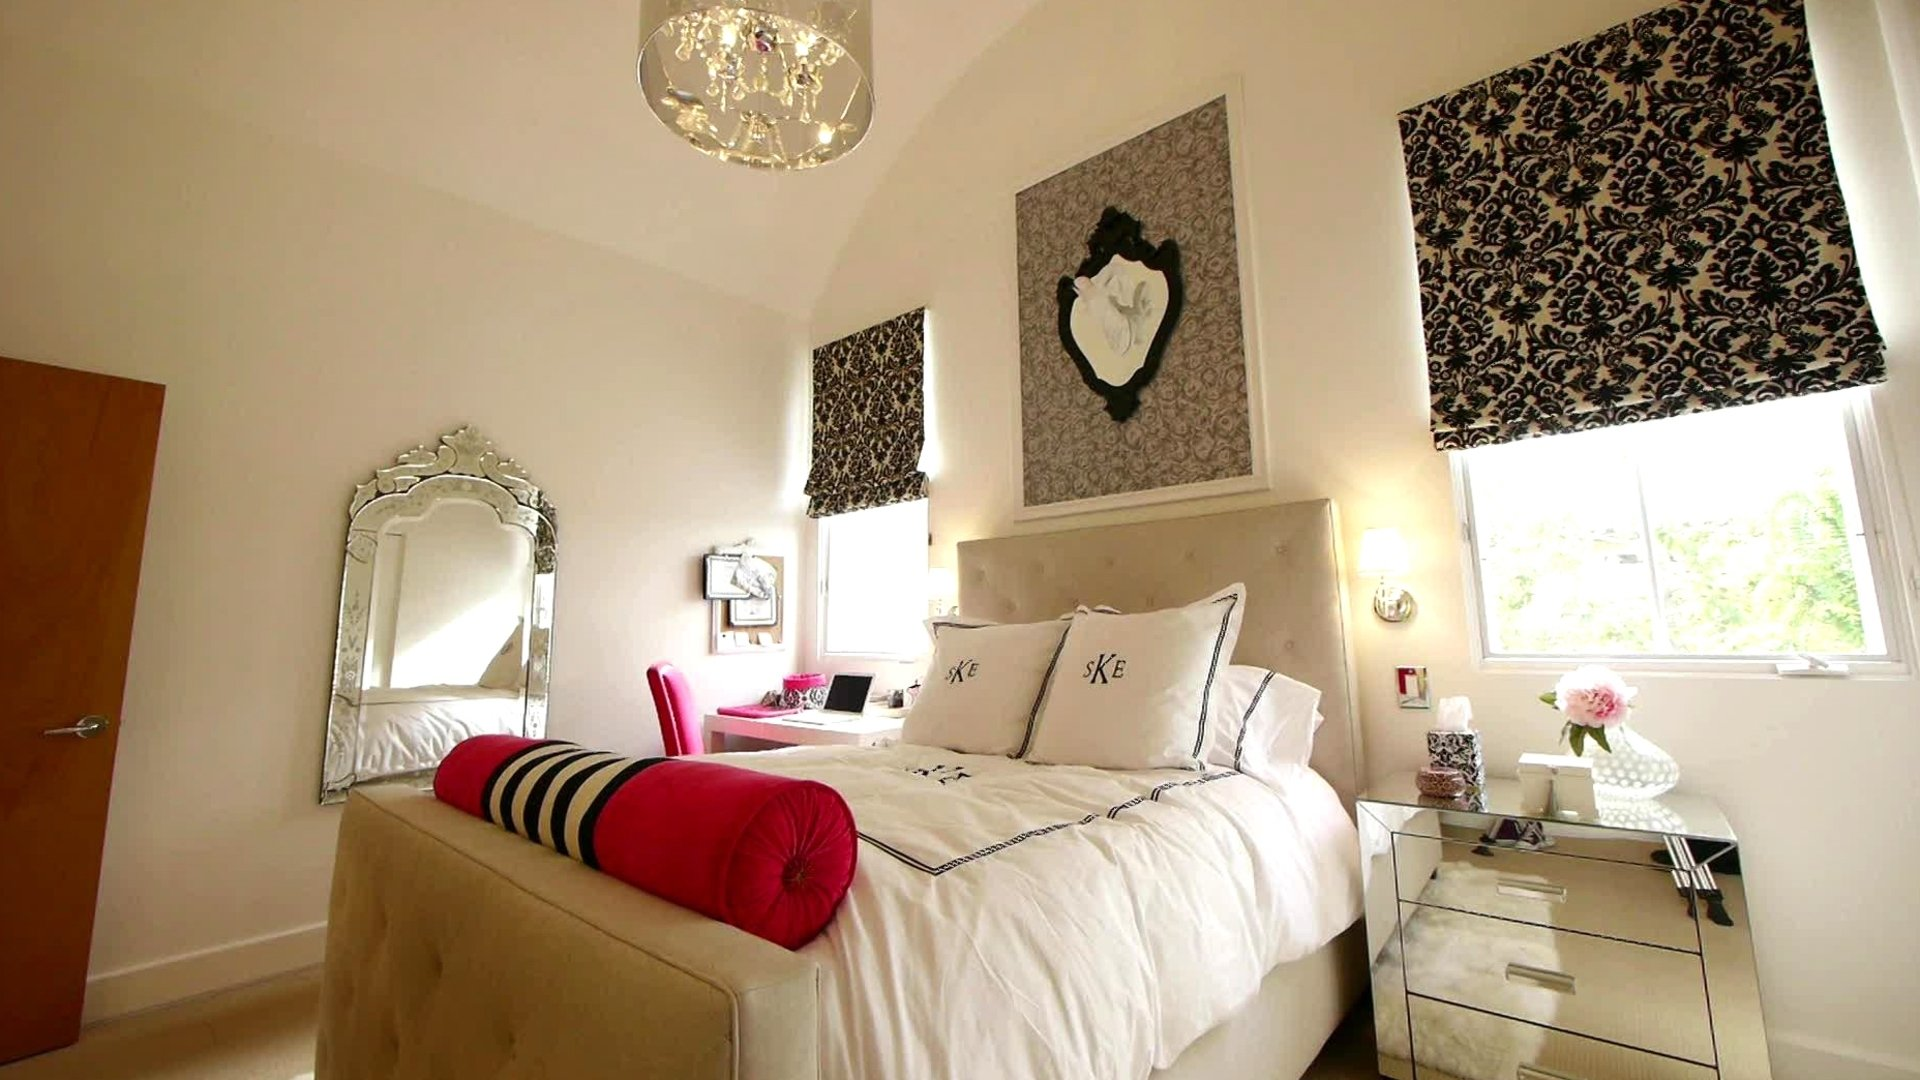 10 Amazing Teenage Bedroom Ideas For Girls teen bedrooms ideas for decorating teen rooms hgtv 8